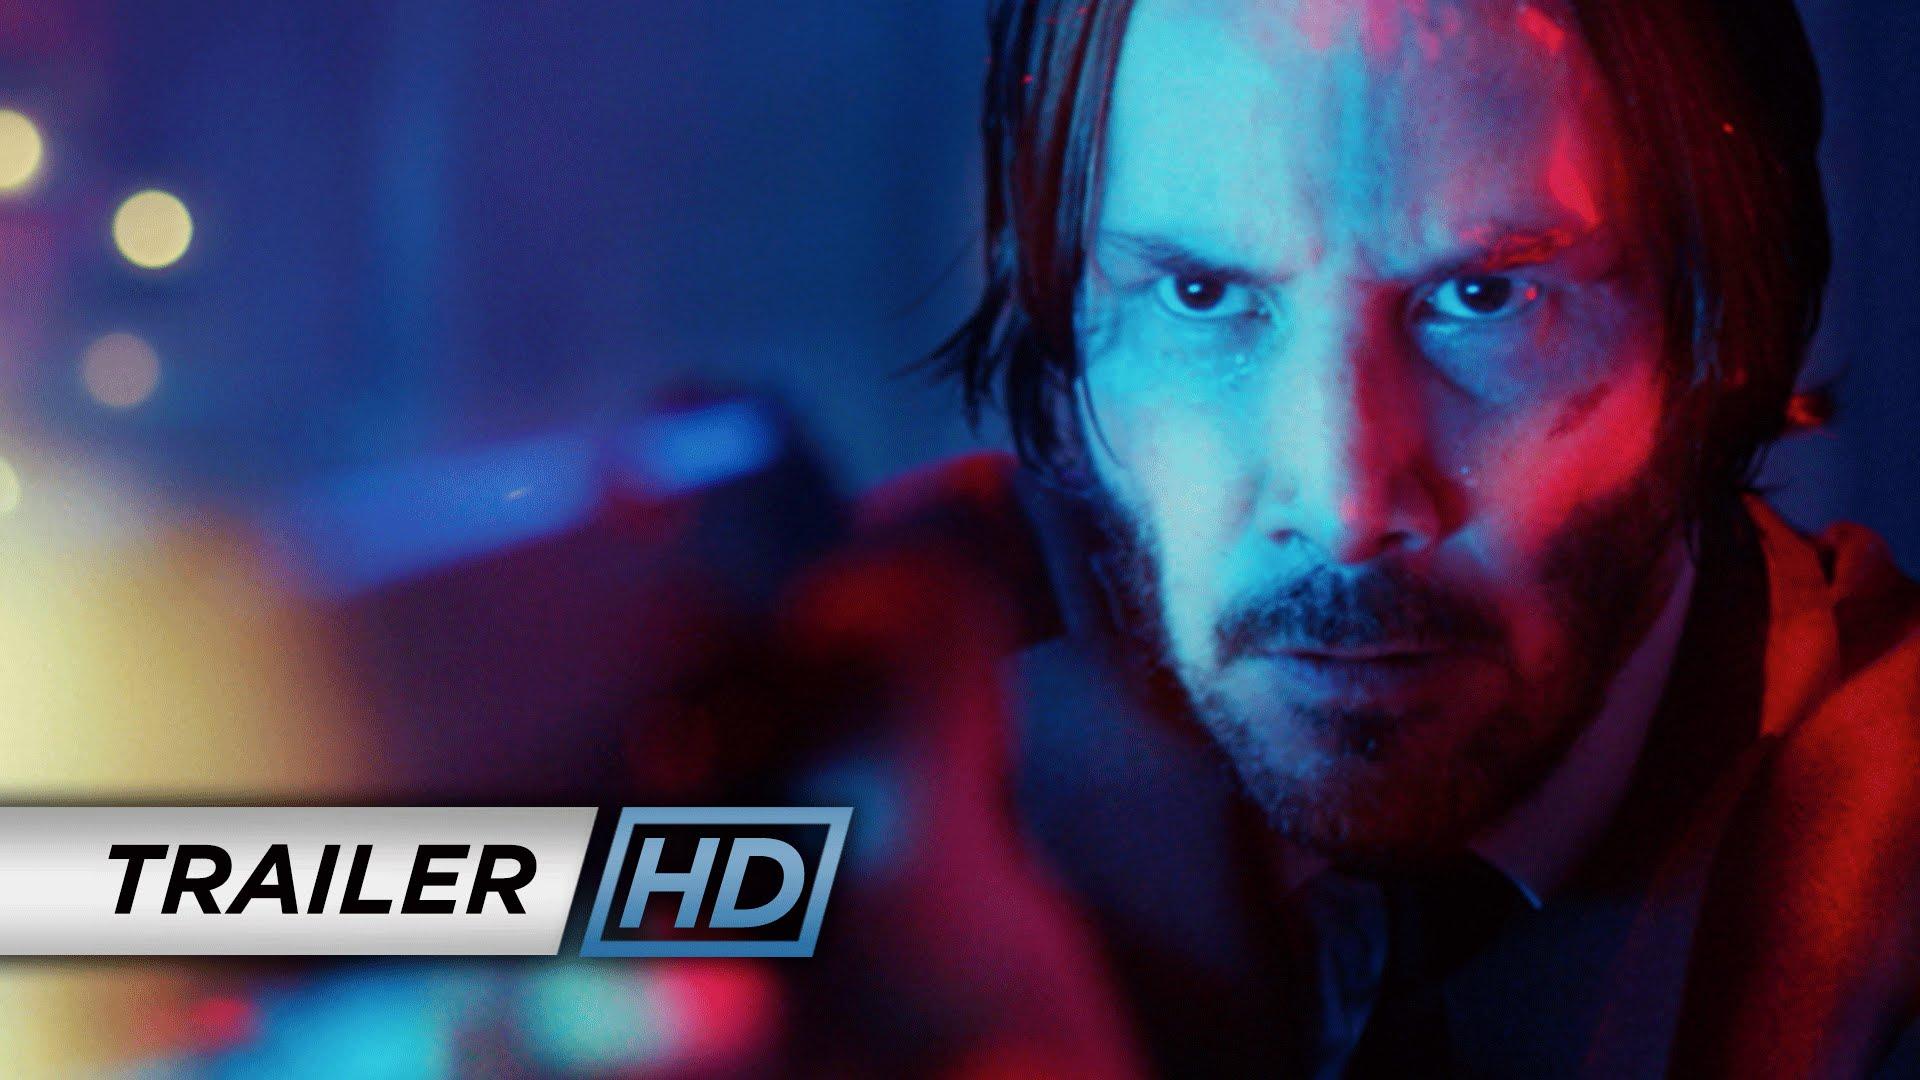 John Wick Trailer